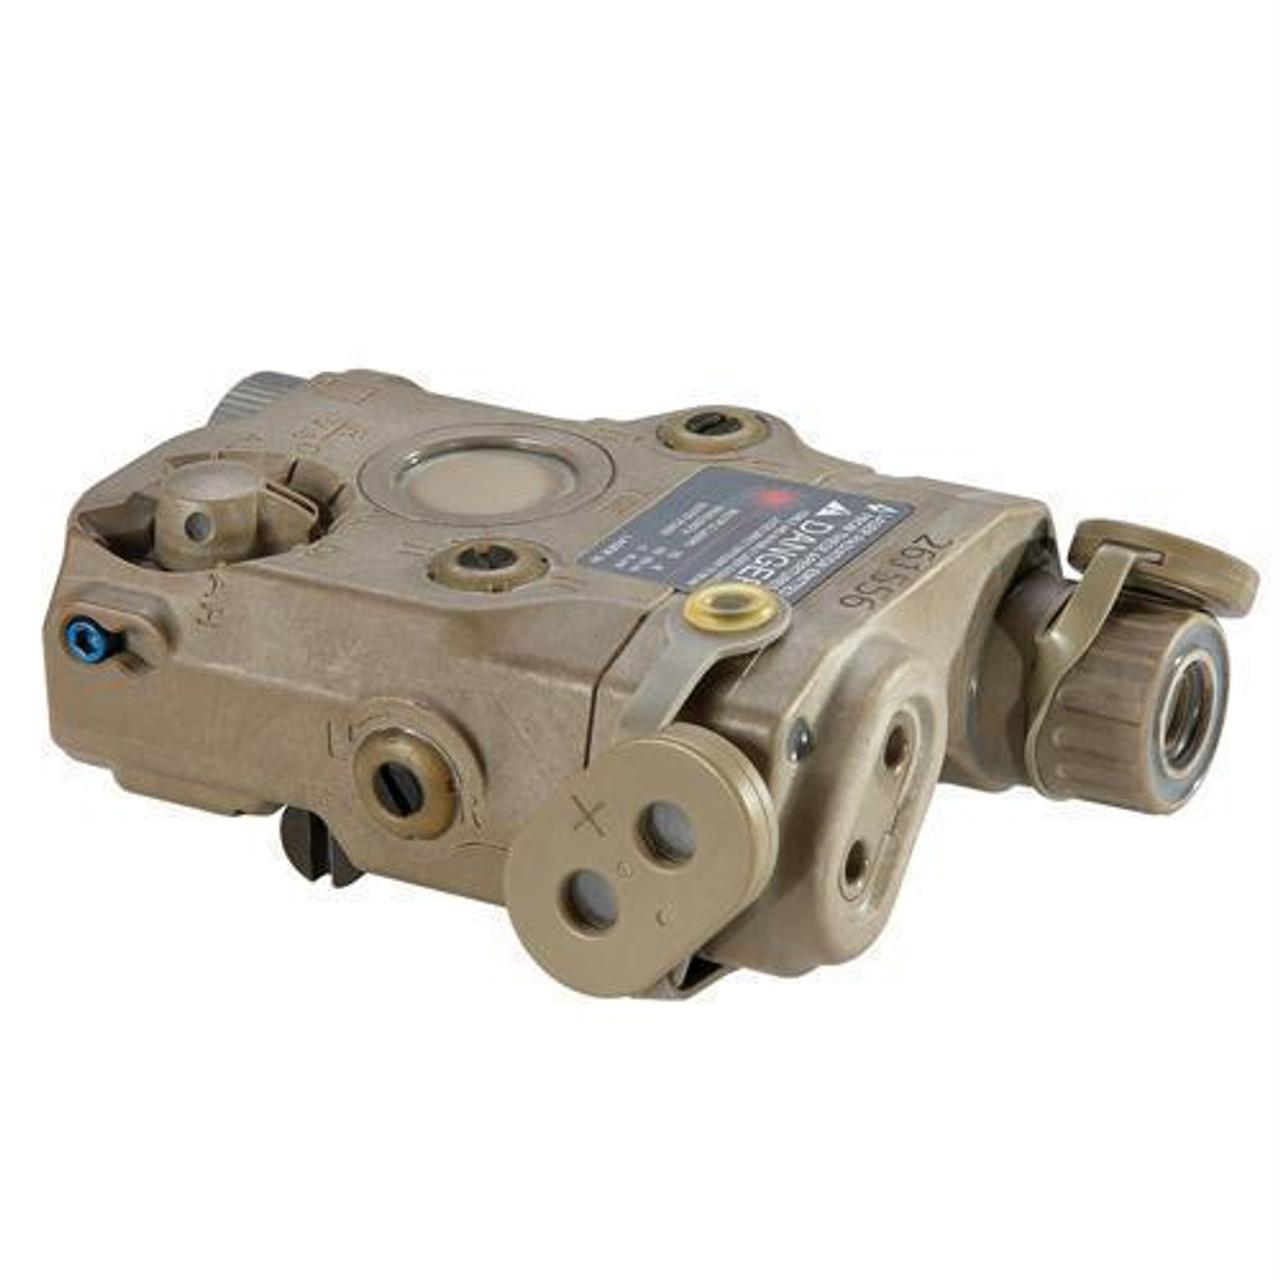 Eotech Laser Aiming System, Atpial-c- Advanced Target Pointer/illuminator/aiming Laser, Mil-spec